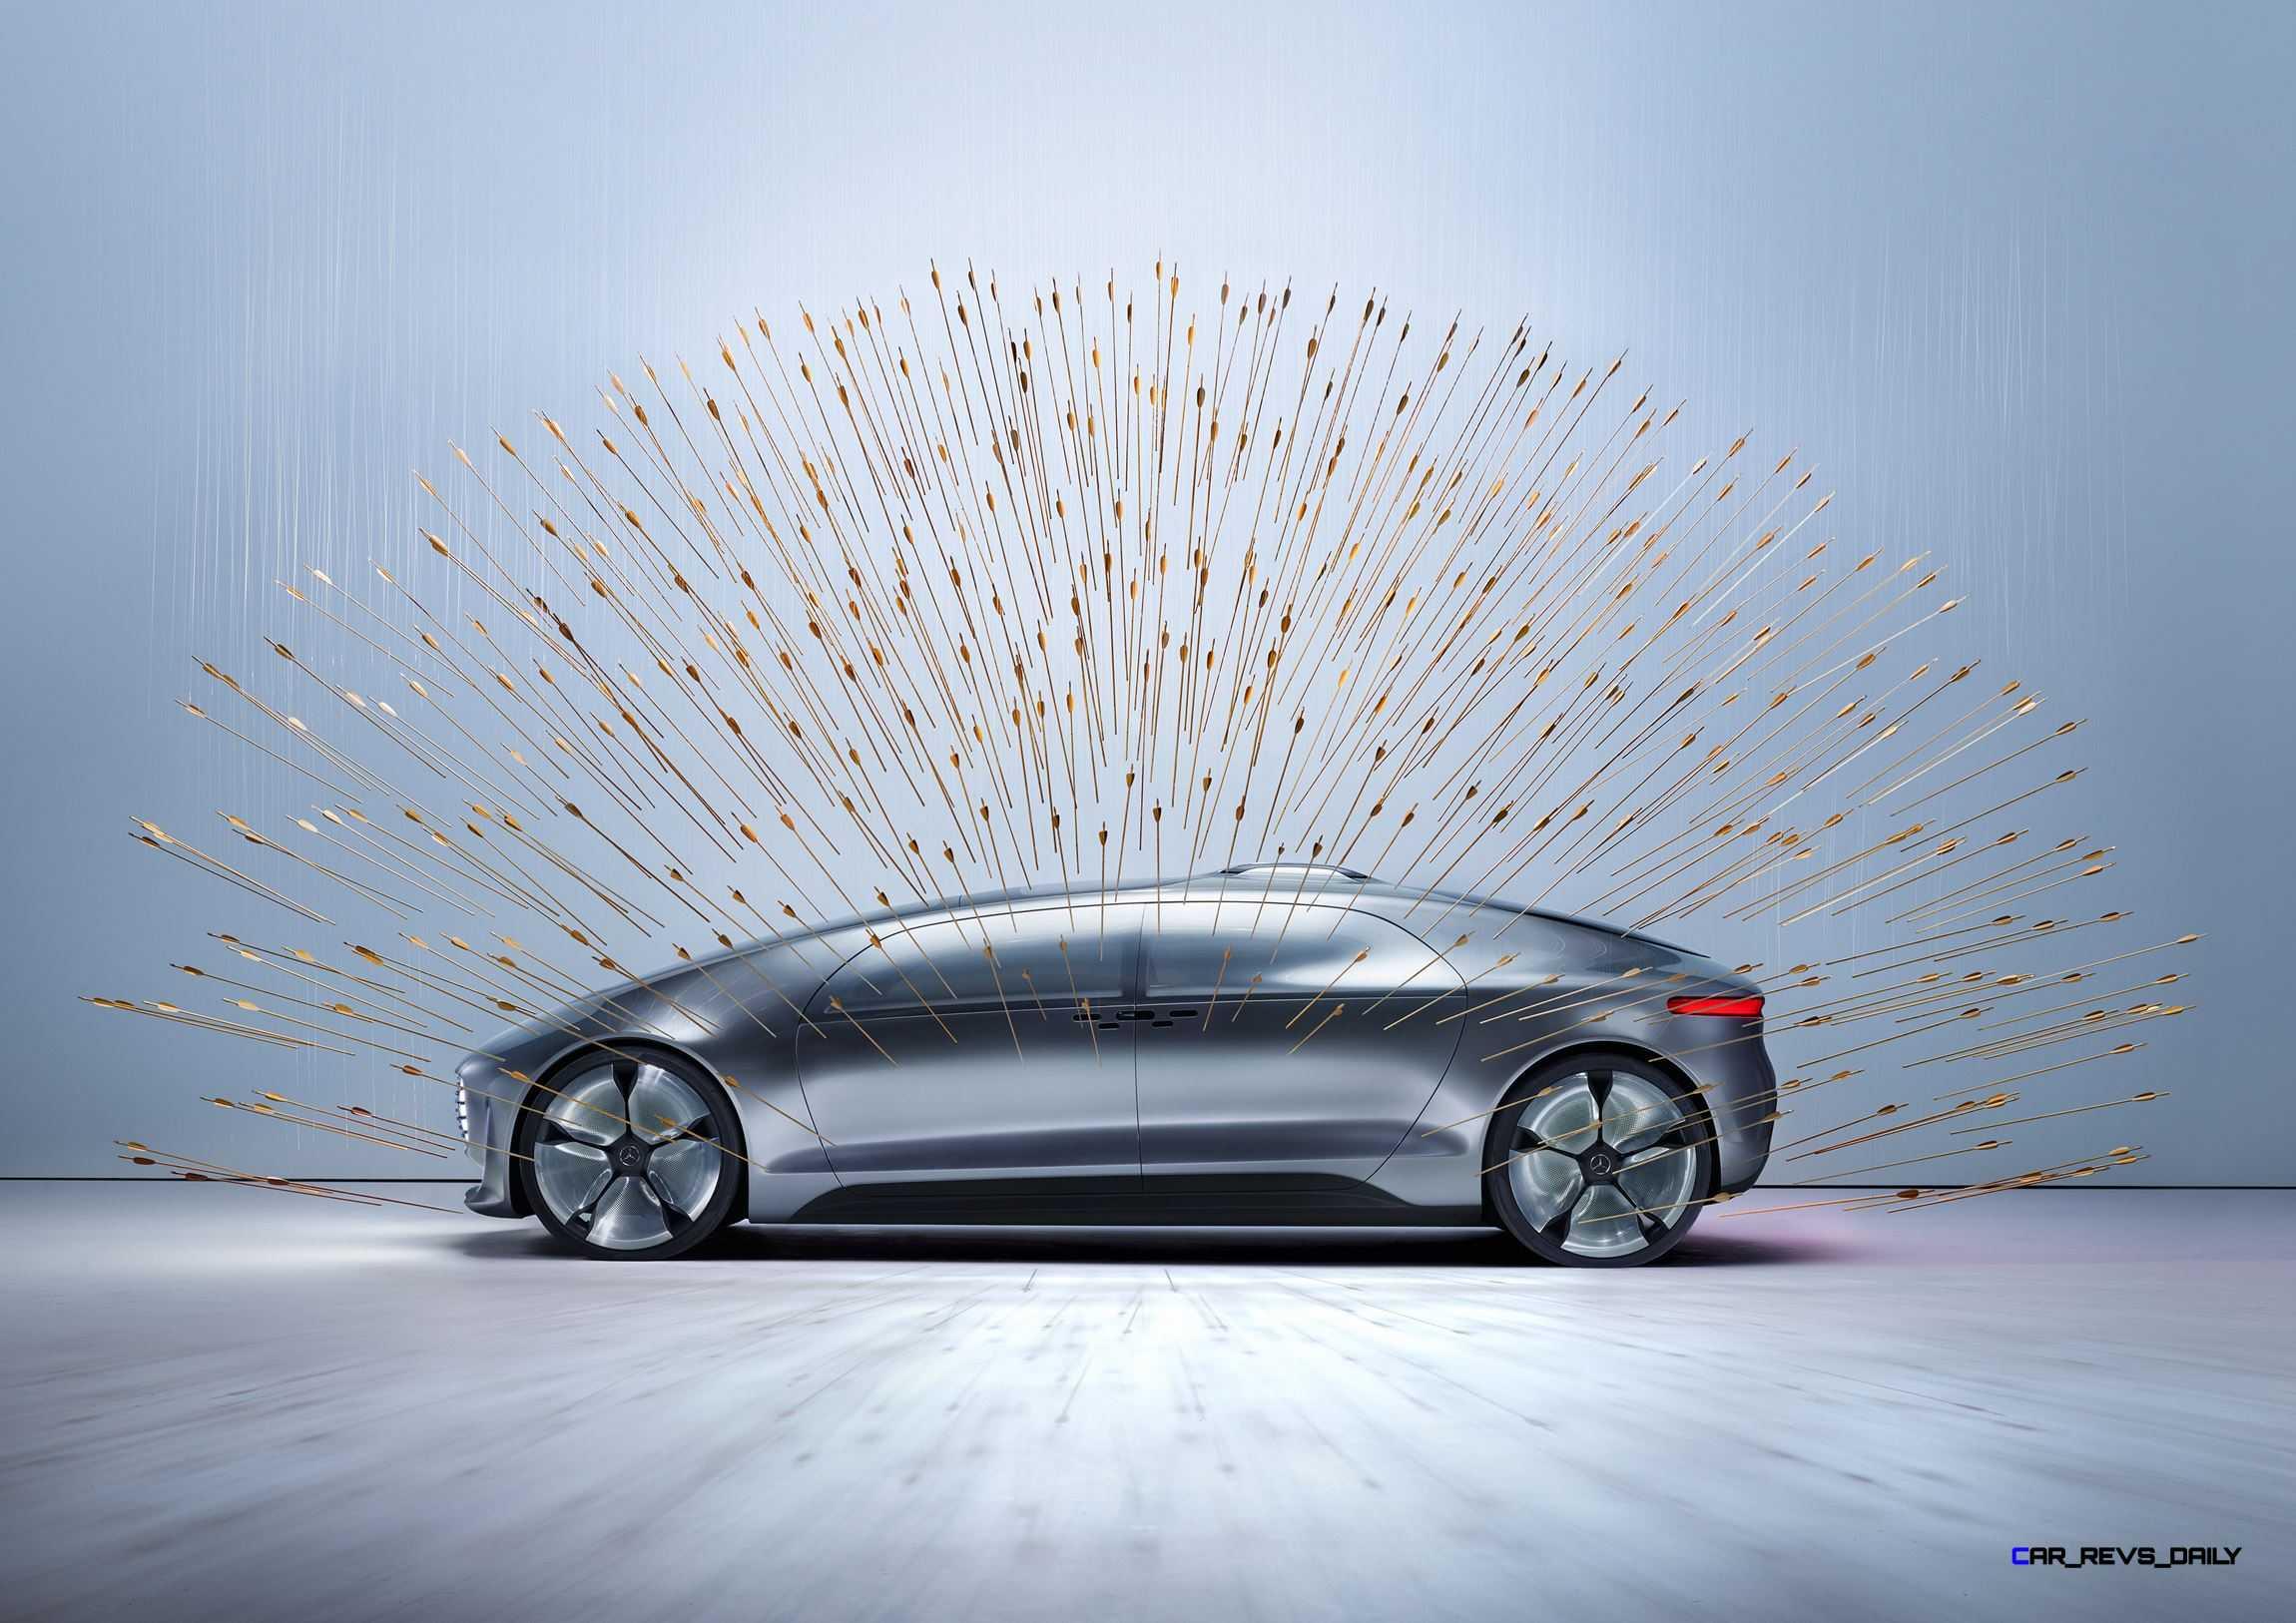 http://www.car-revs-daily.com/wp-content/uploads/2015/09/Update1-2015-Mercedes-Benz-Concept-IAA-Frankfurt-S-Class-Cabrio-Reveal-4.jpg